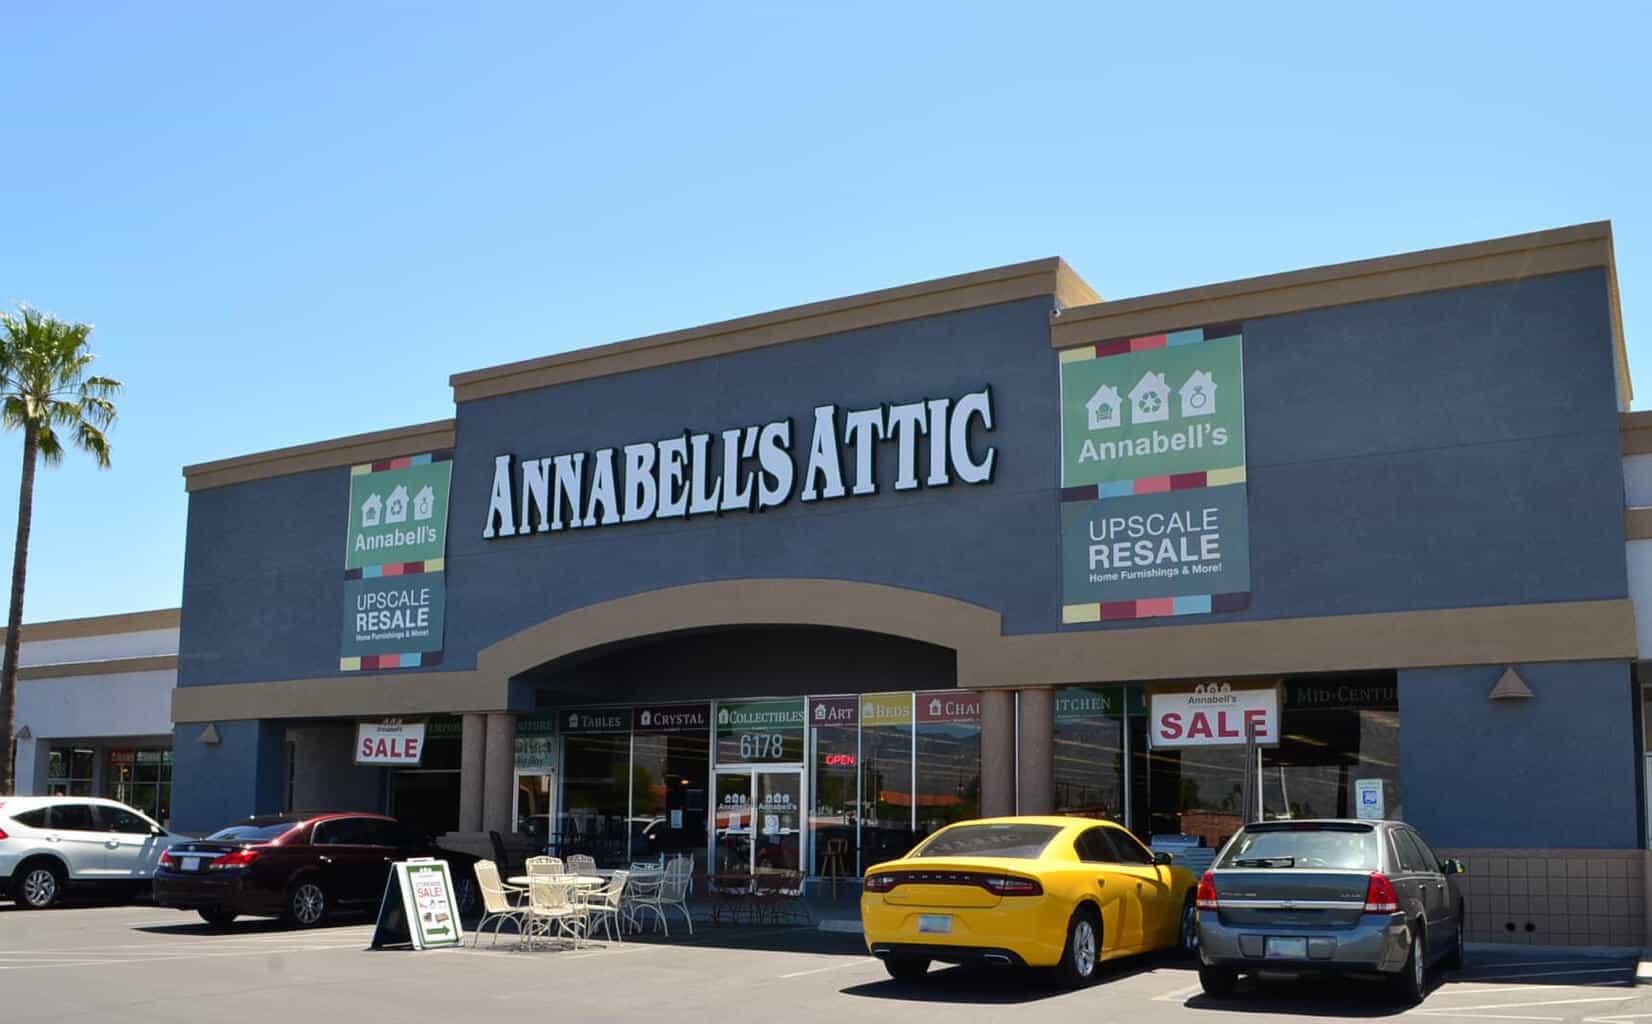 Annabell's Attic